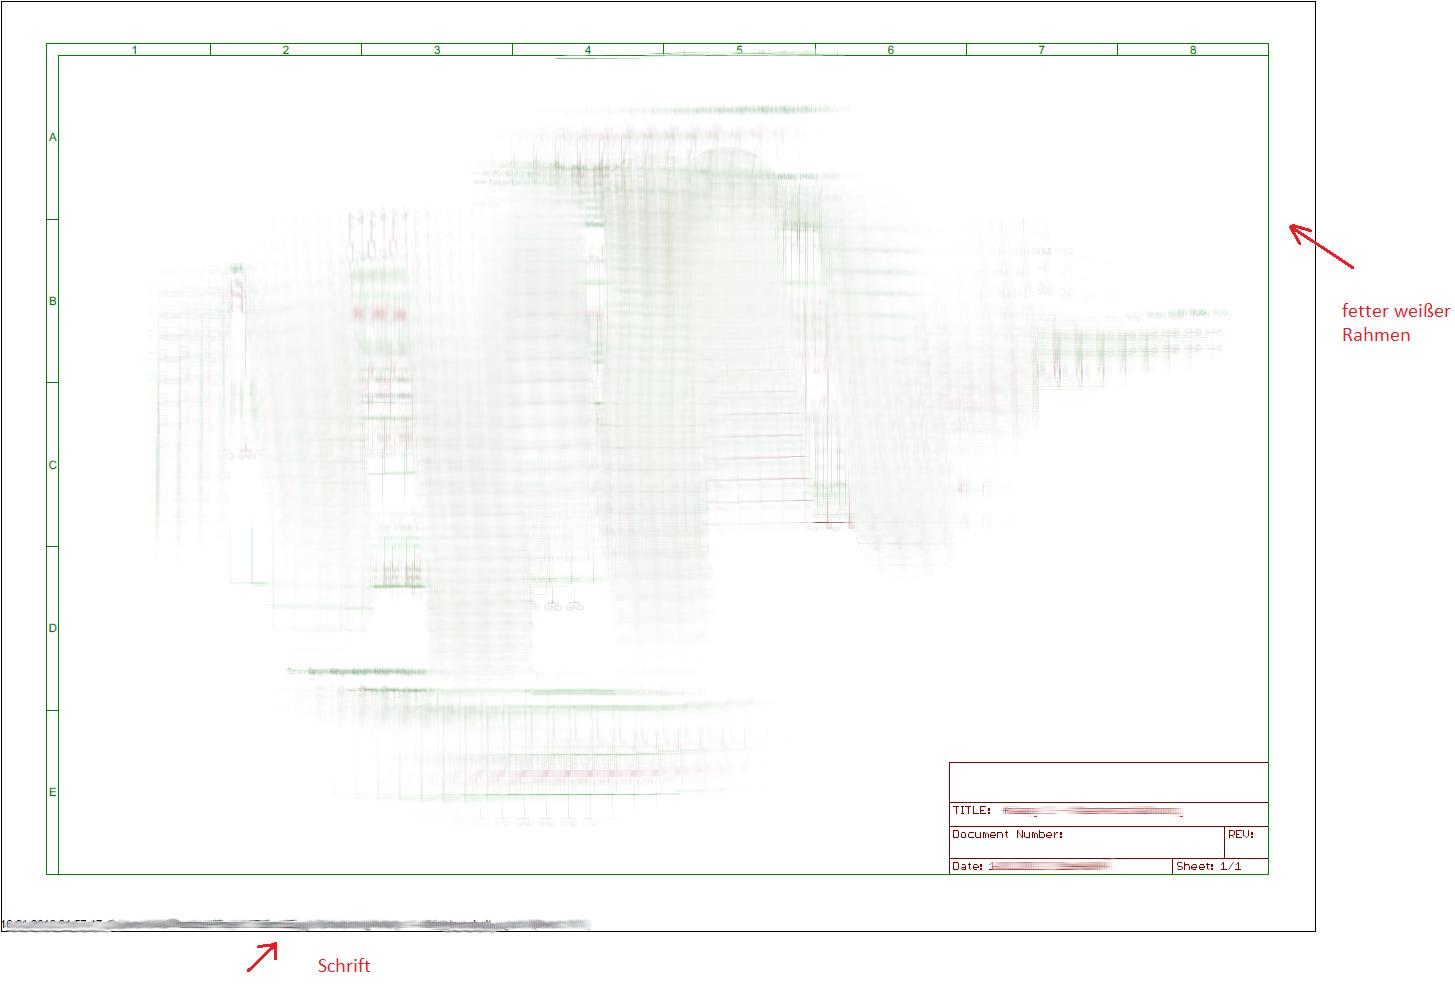 eagle light - techn. Zeichnungsrahmen - Mikrocontroller.net